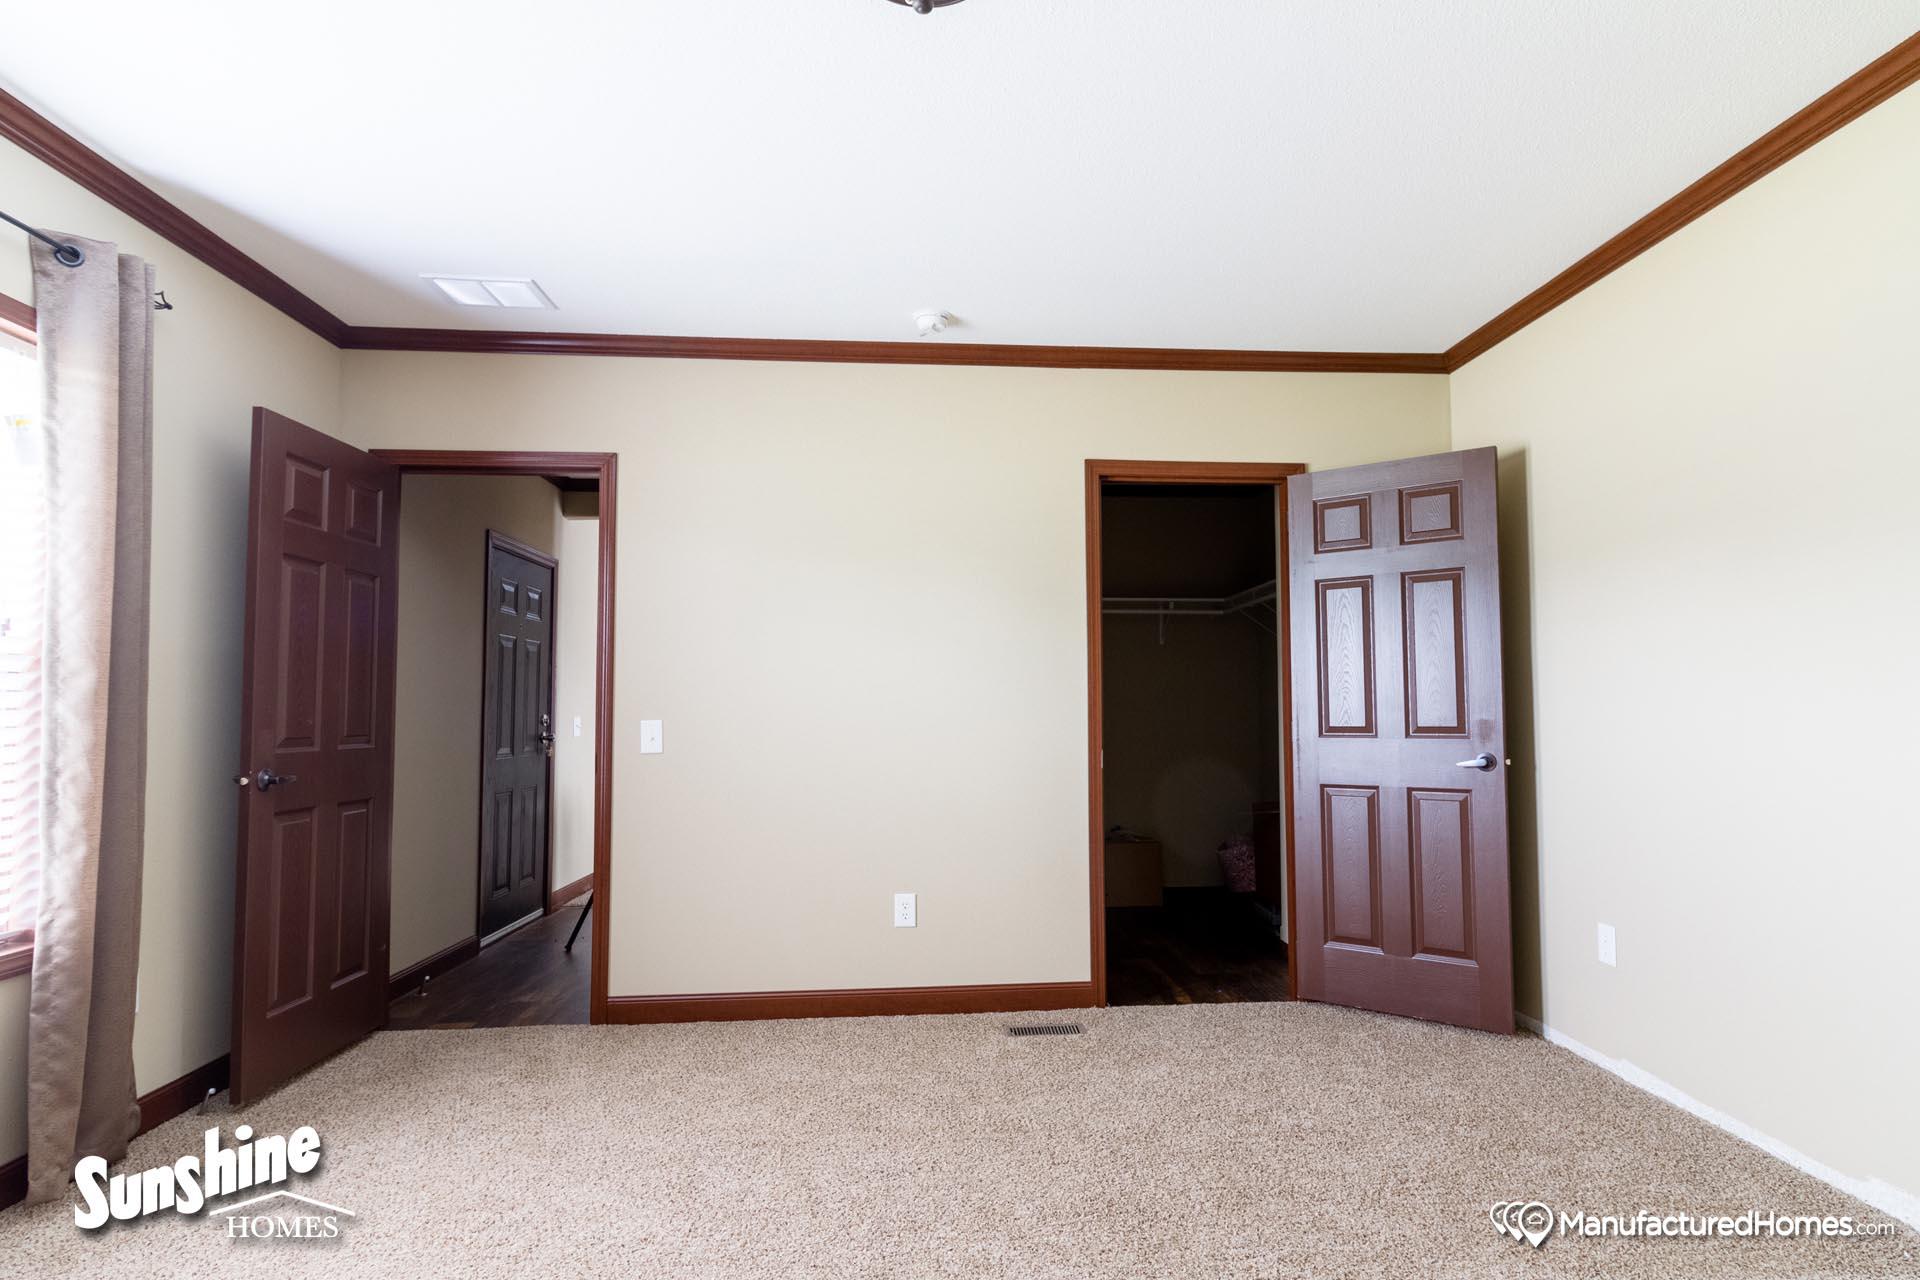 Arkansas Home Center in Beebe, AR - Manufactured Home Dealer